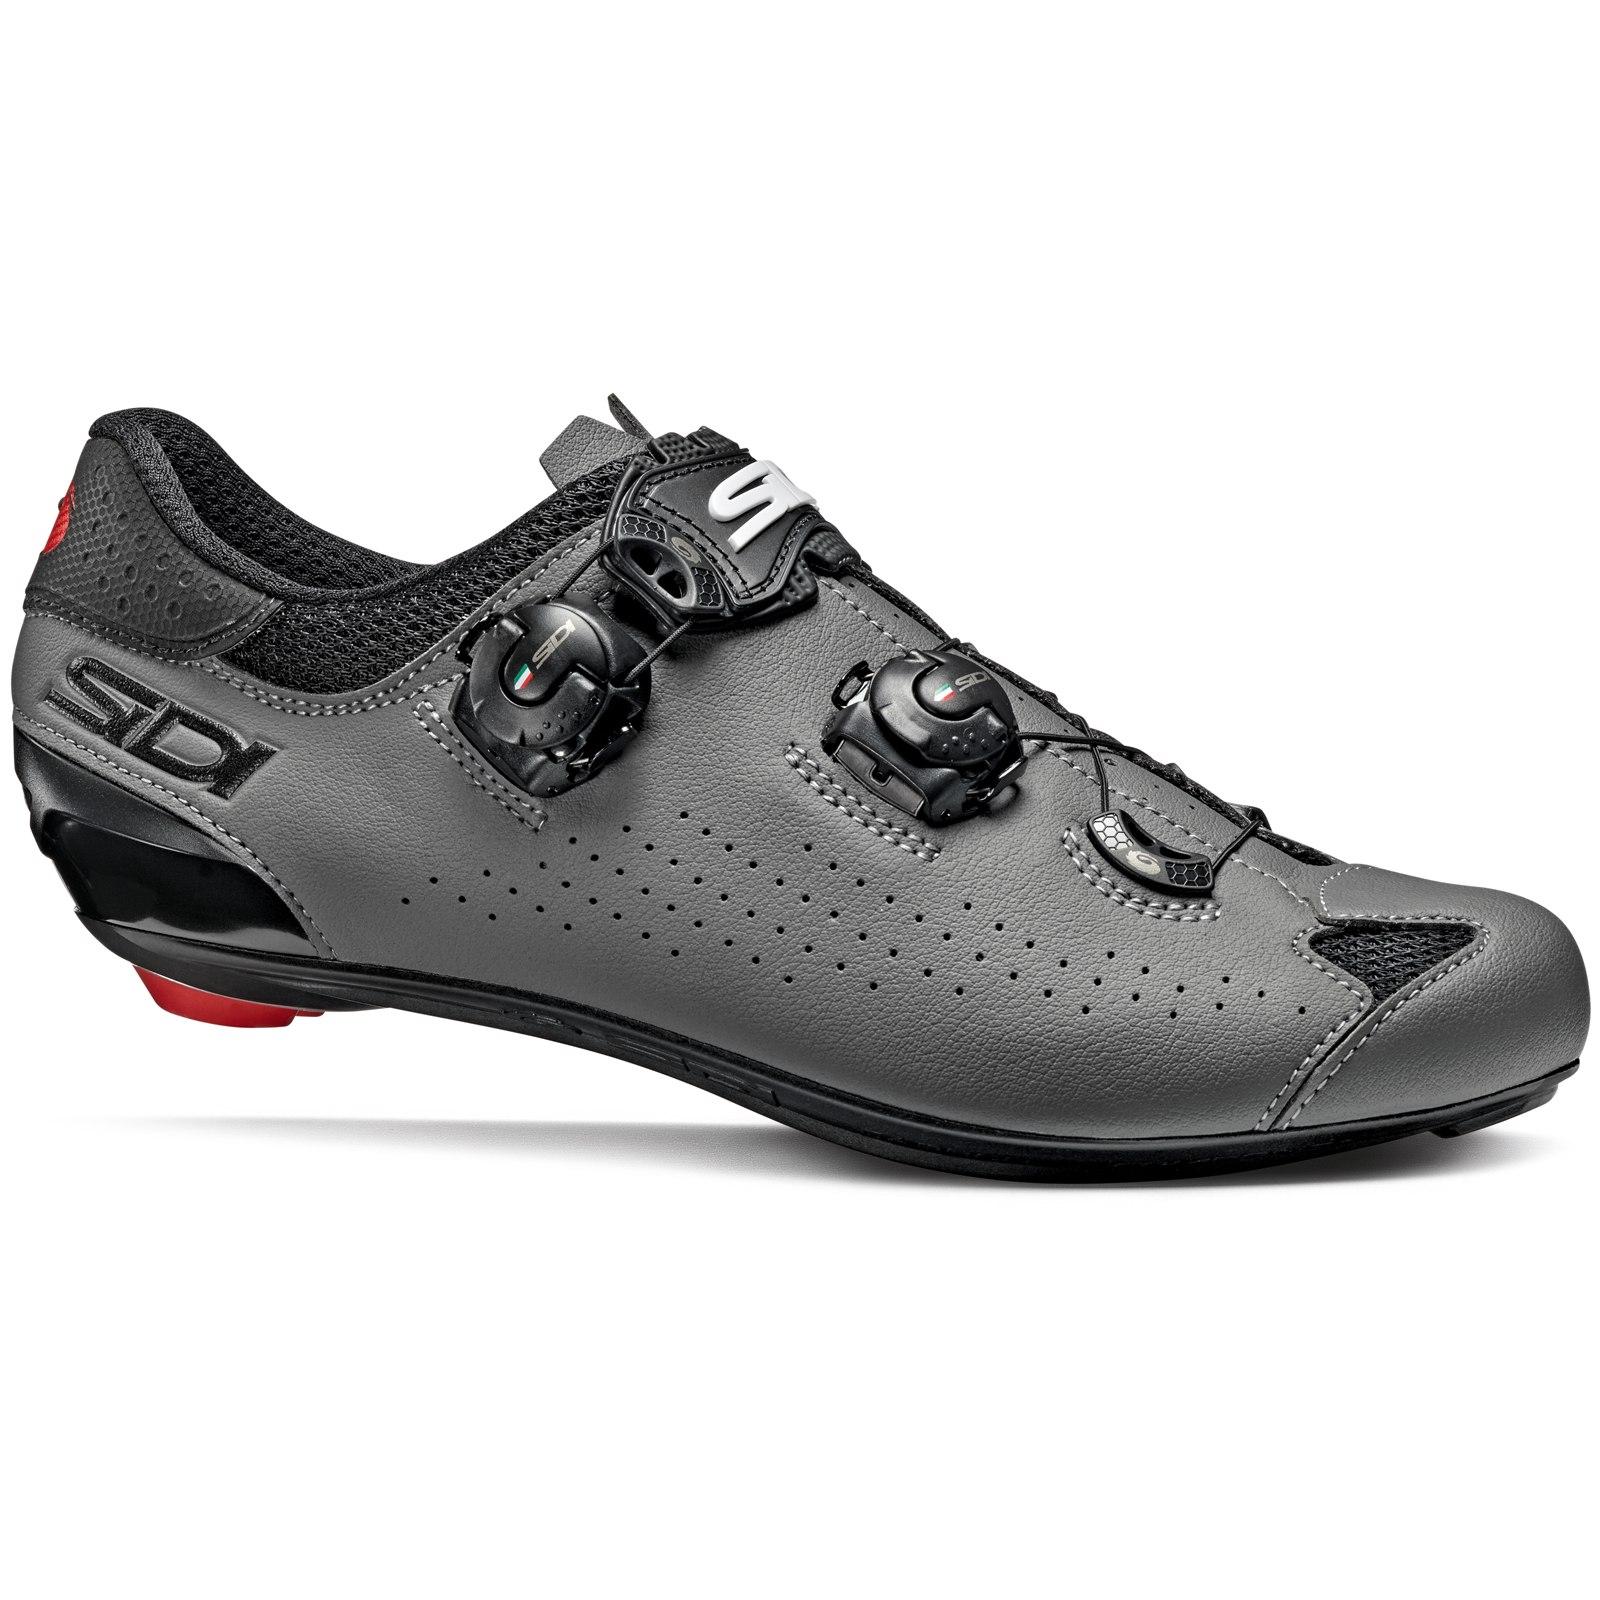 Sidi Genius 10 Zapatillas Ciclismo Carretera - negro/gris